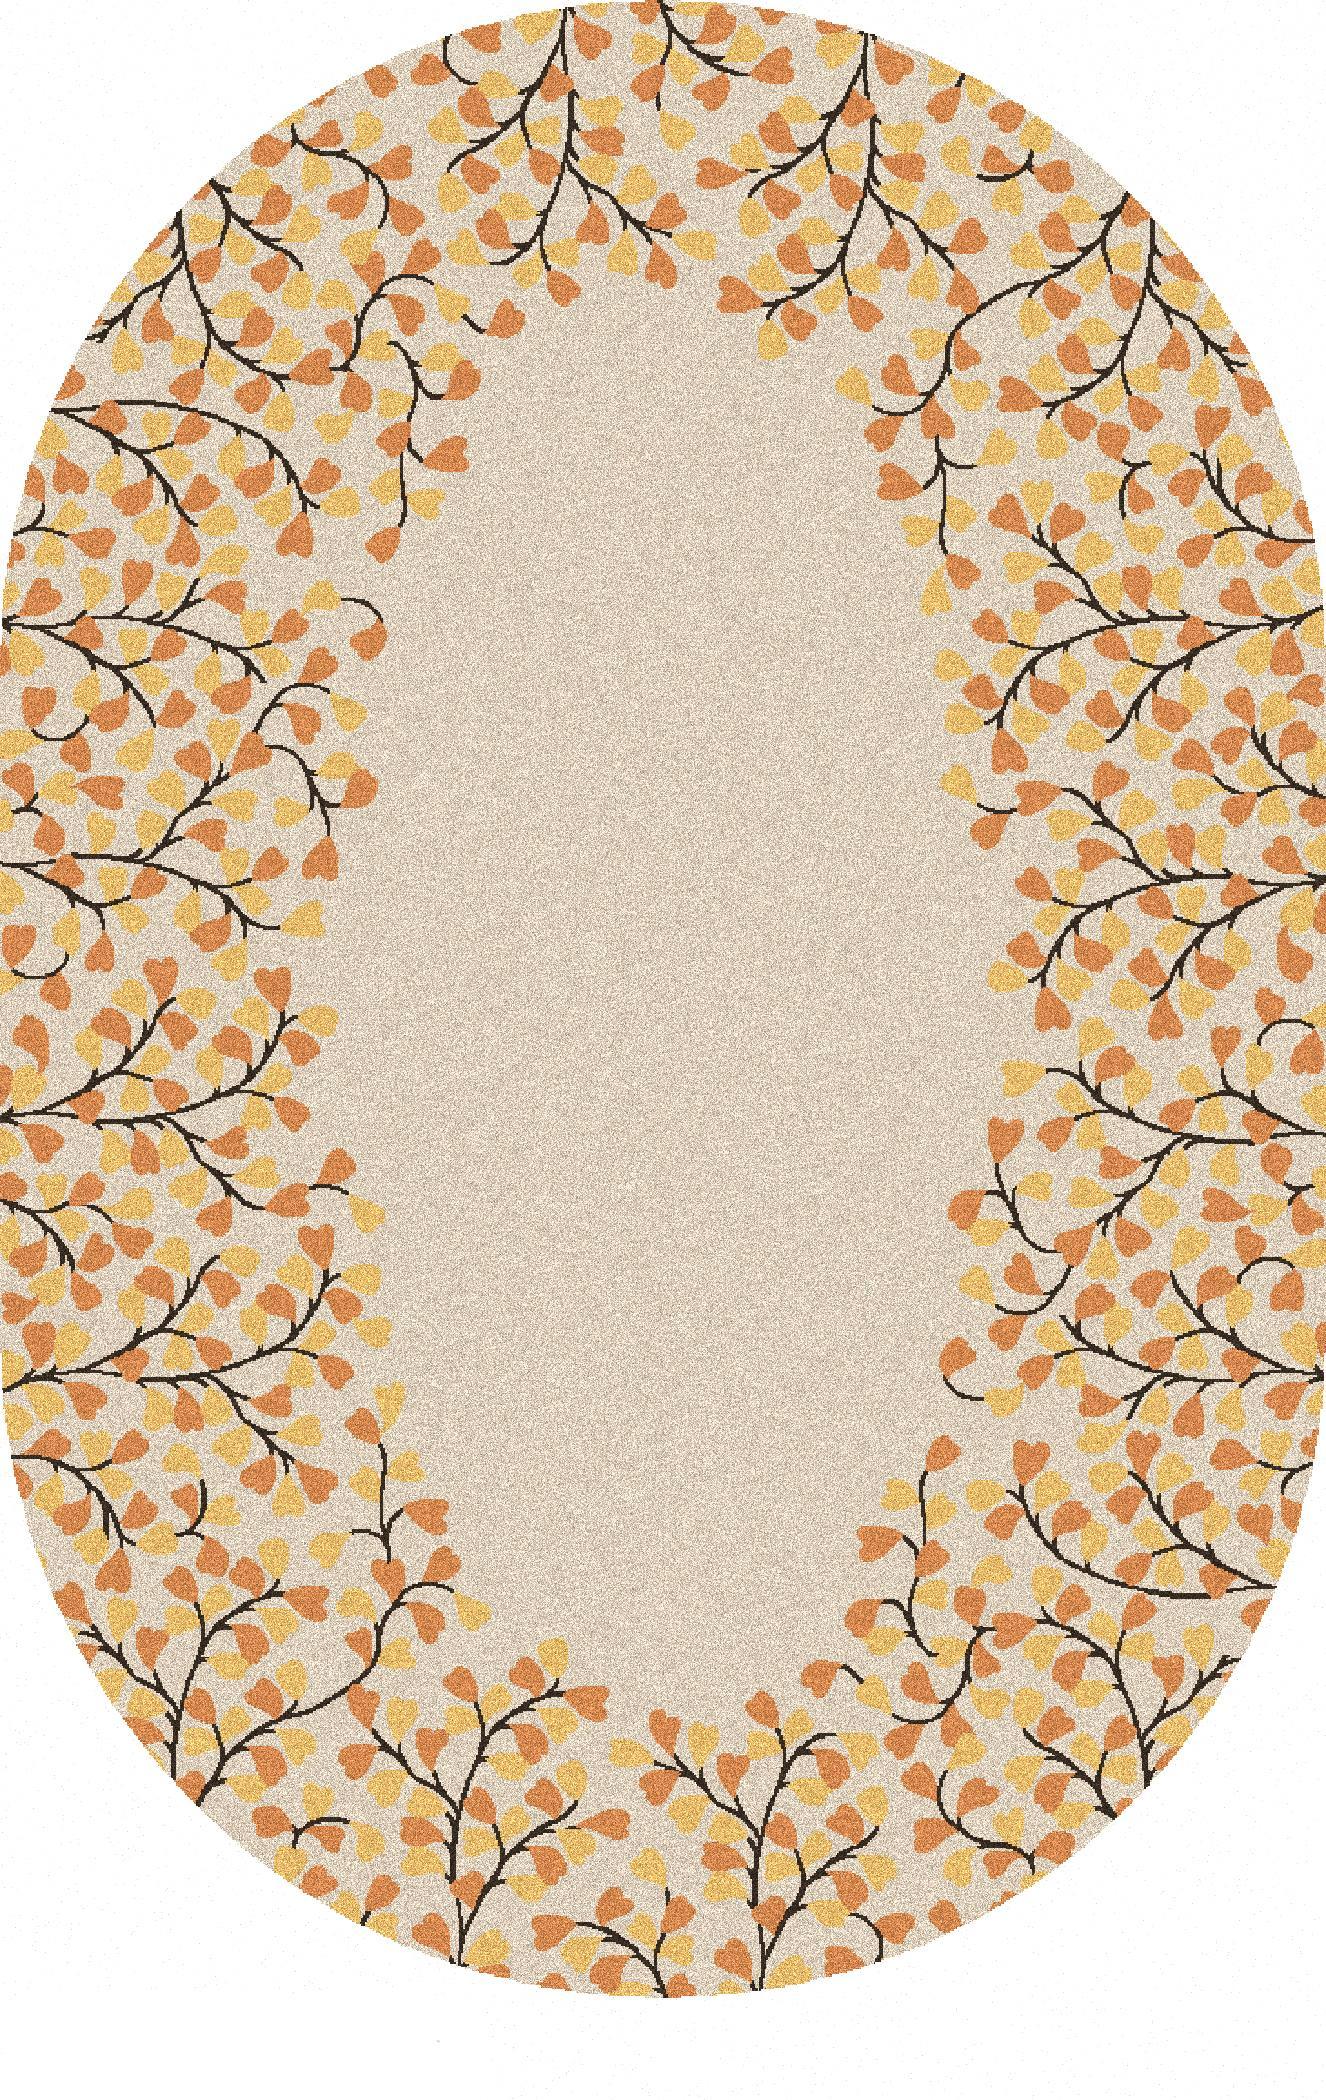 Surya Rugs Athena 8' x 10' Oval - Item Number: ATH5118-810OV